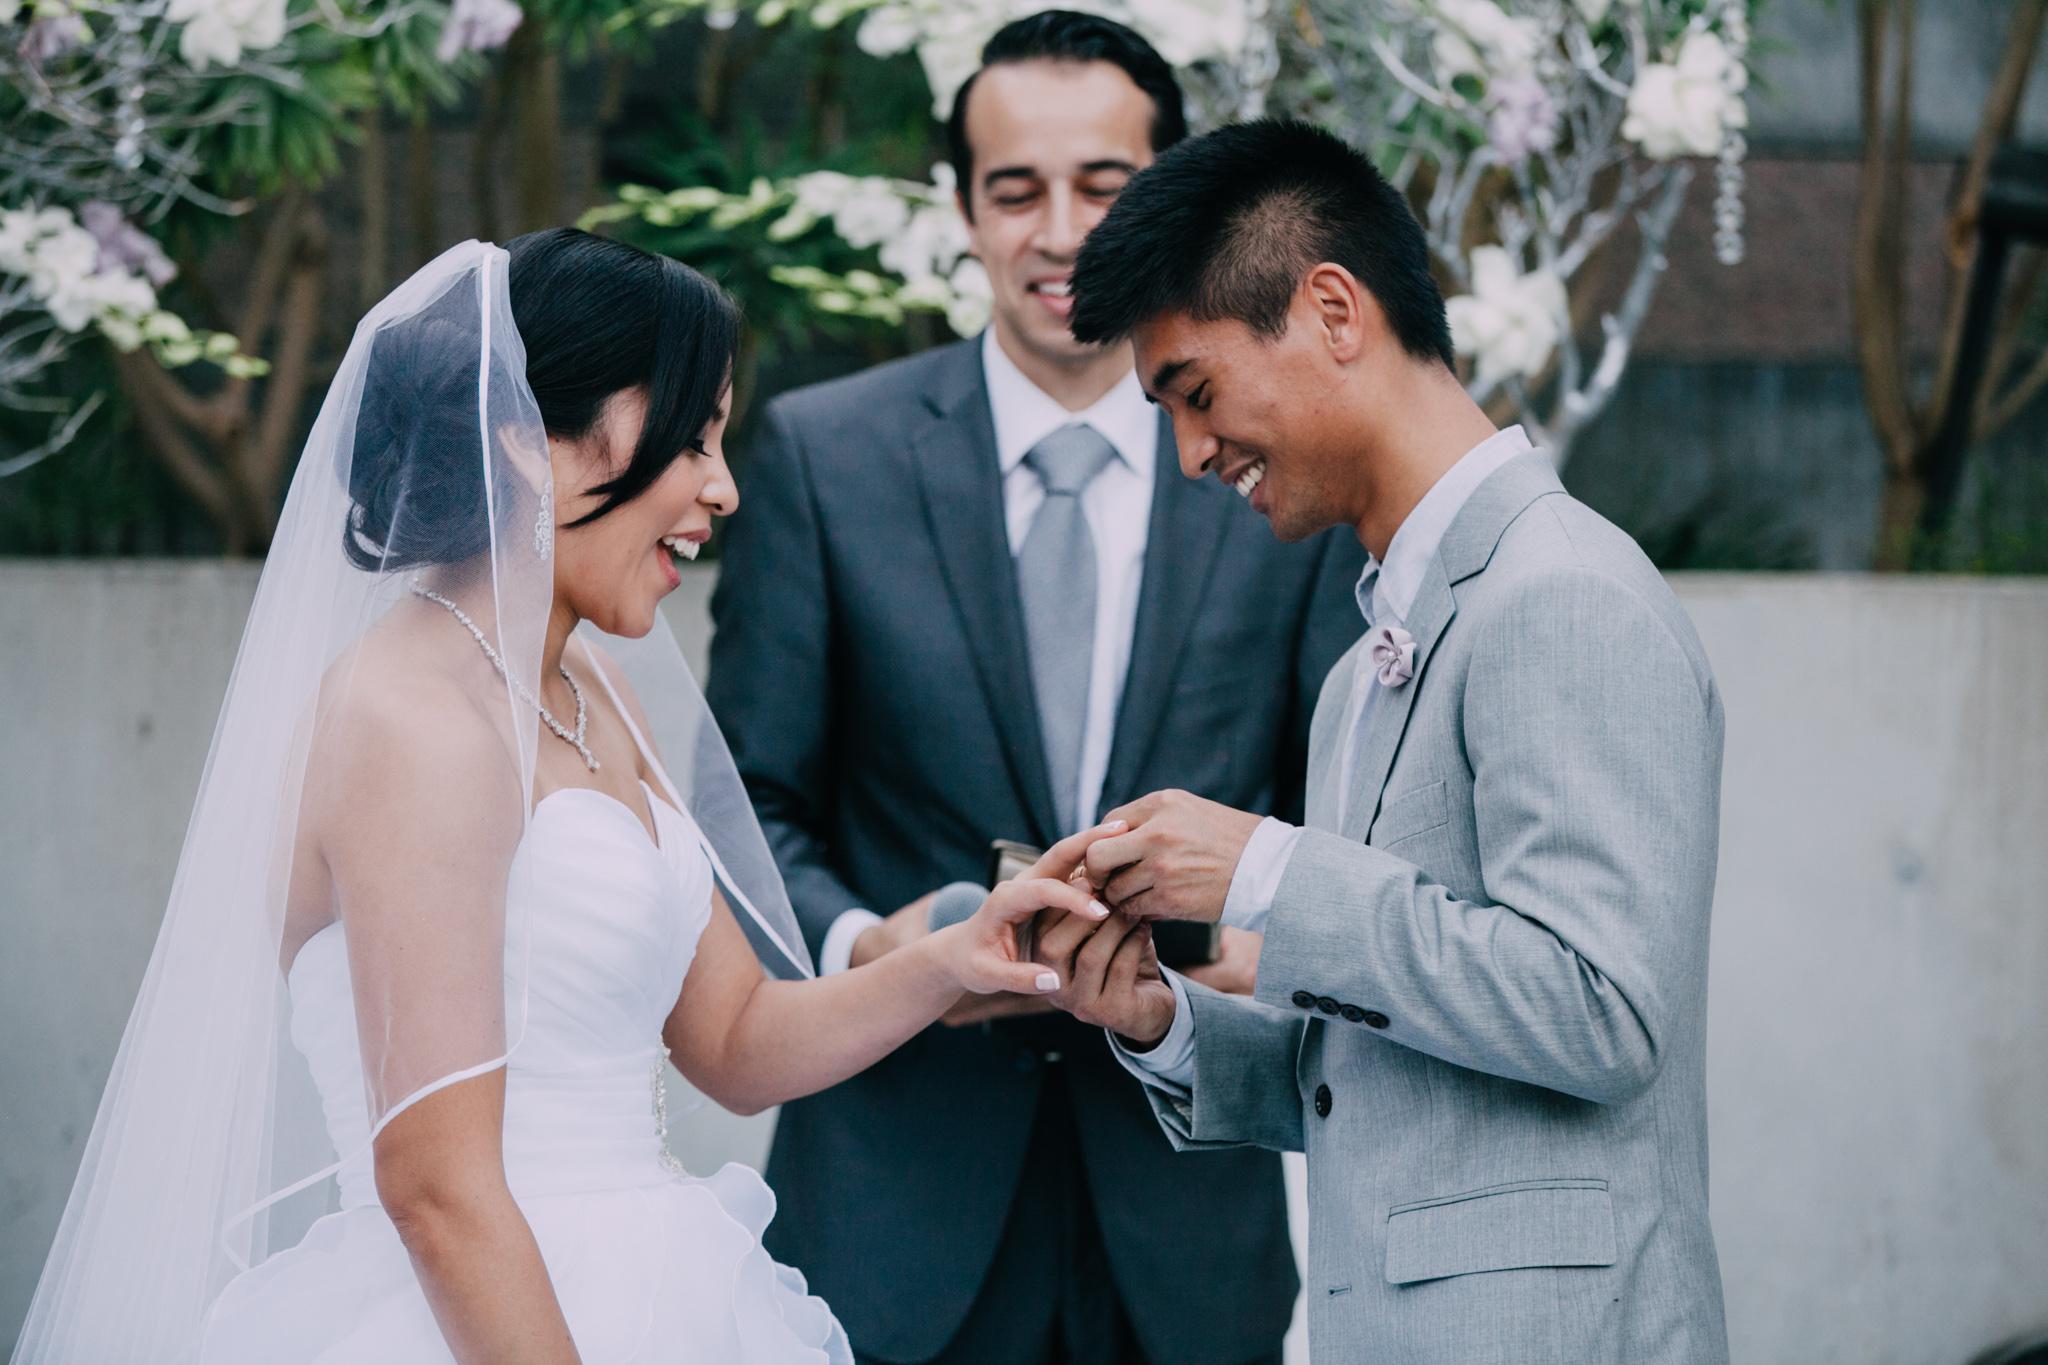 skirball cultural center wedding-143.jpg